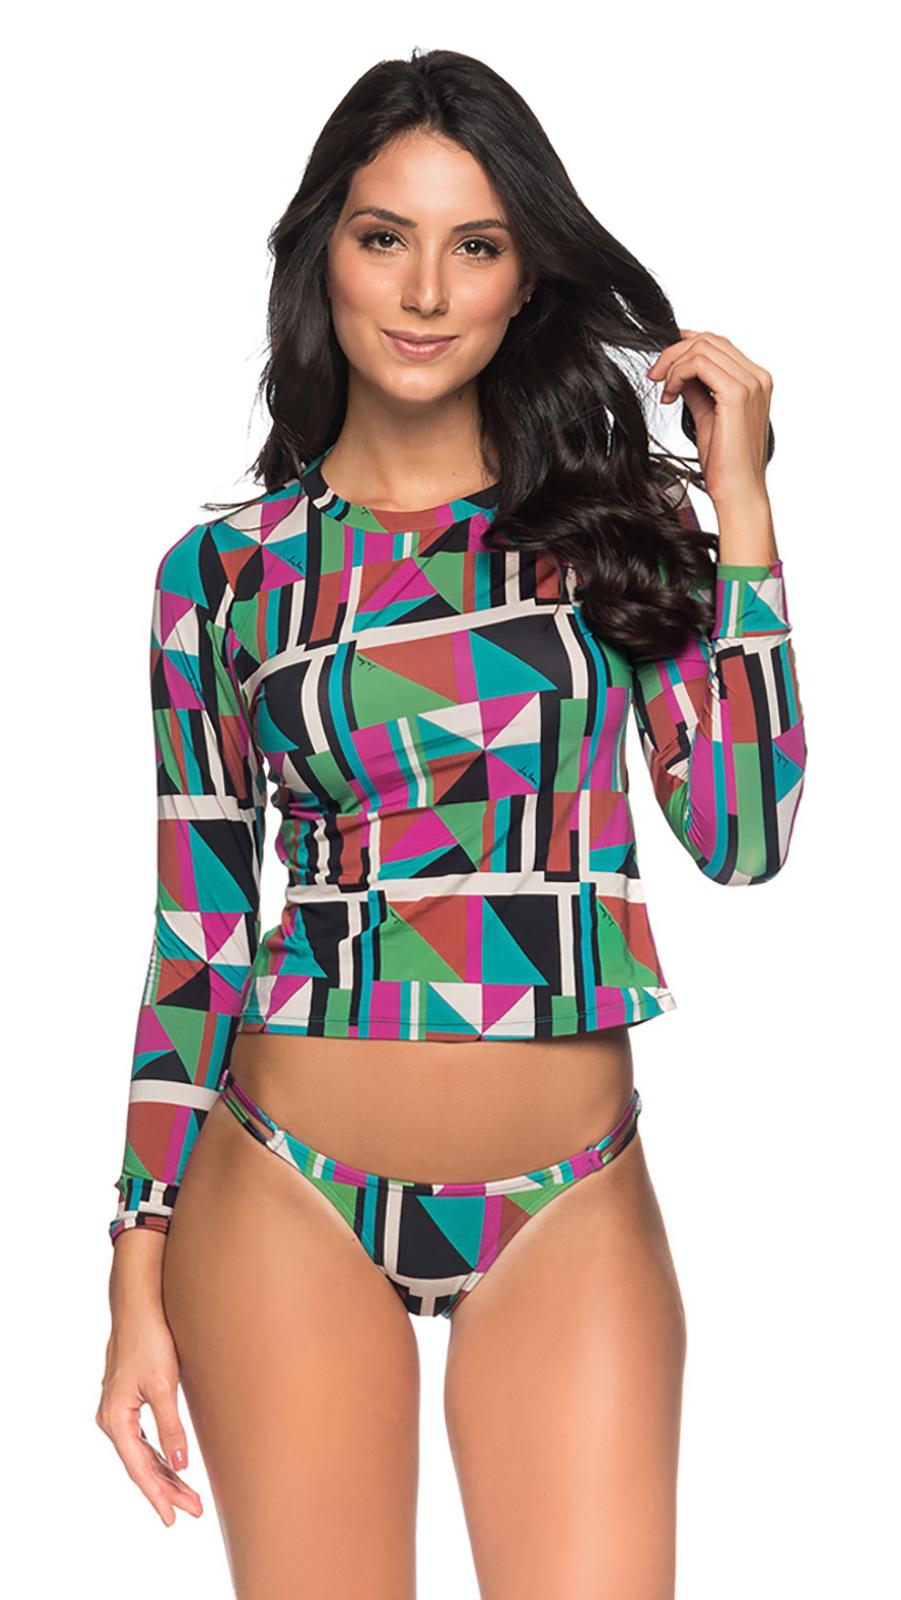 27a012ce64327 Long sleeve bikini in colorful geometric print - LONGA DELAUNAY ...